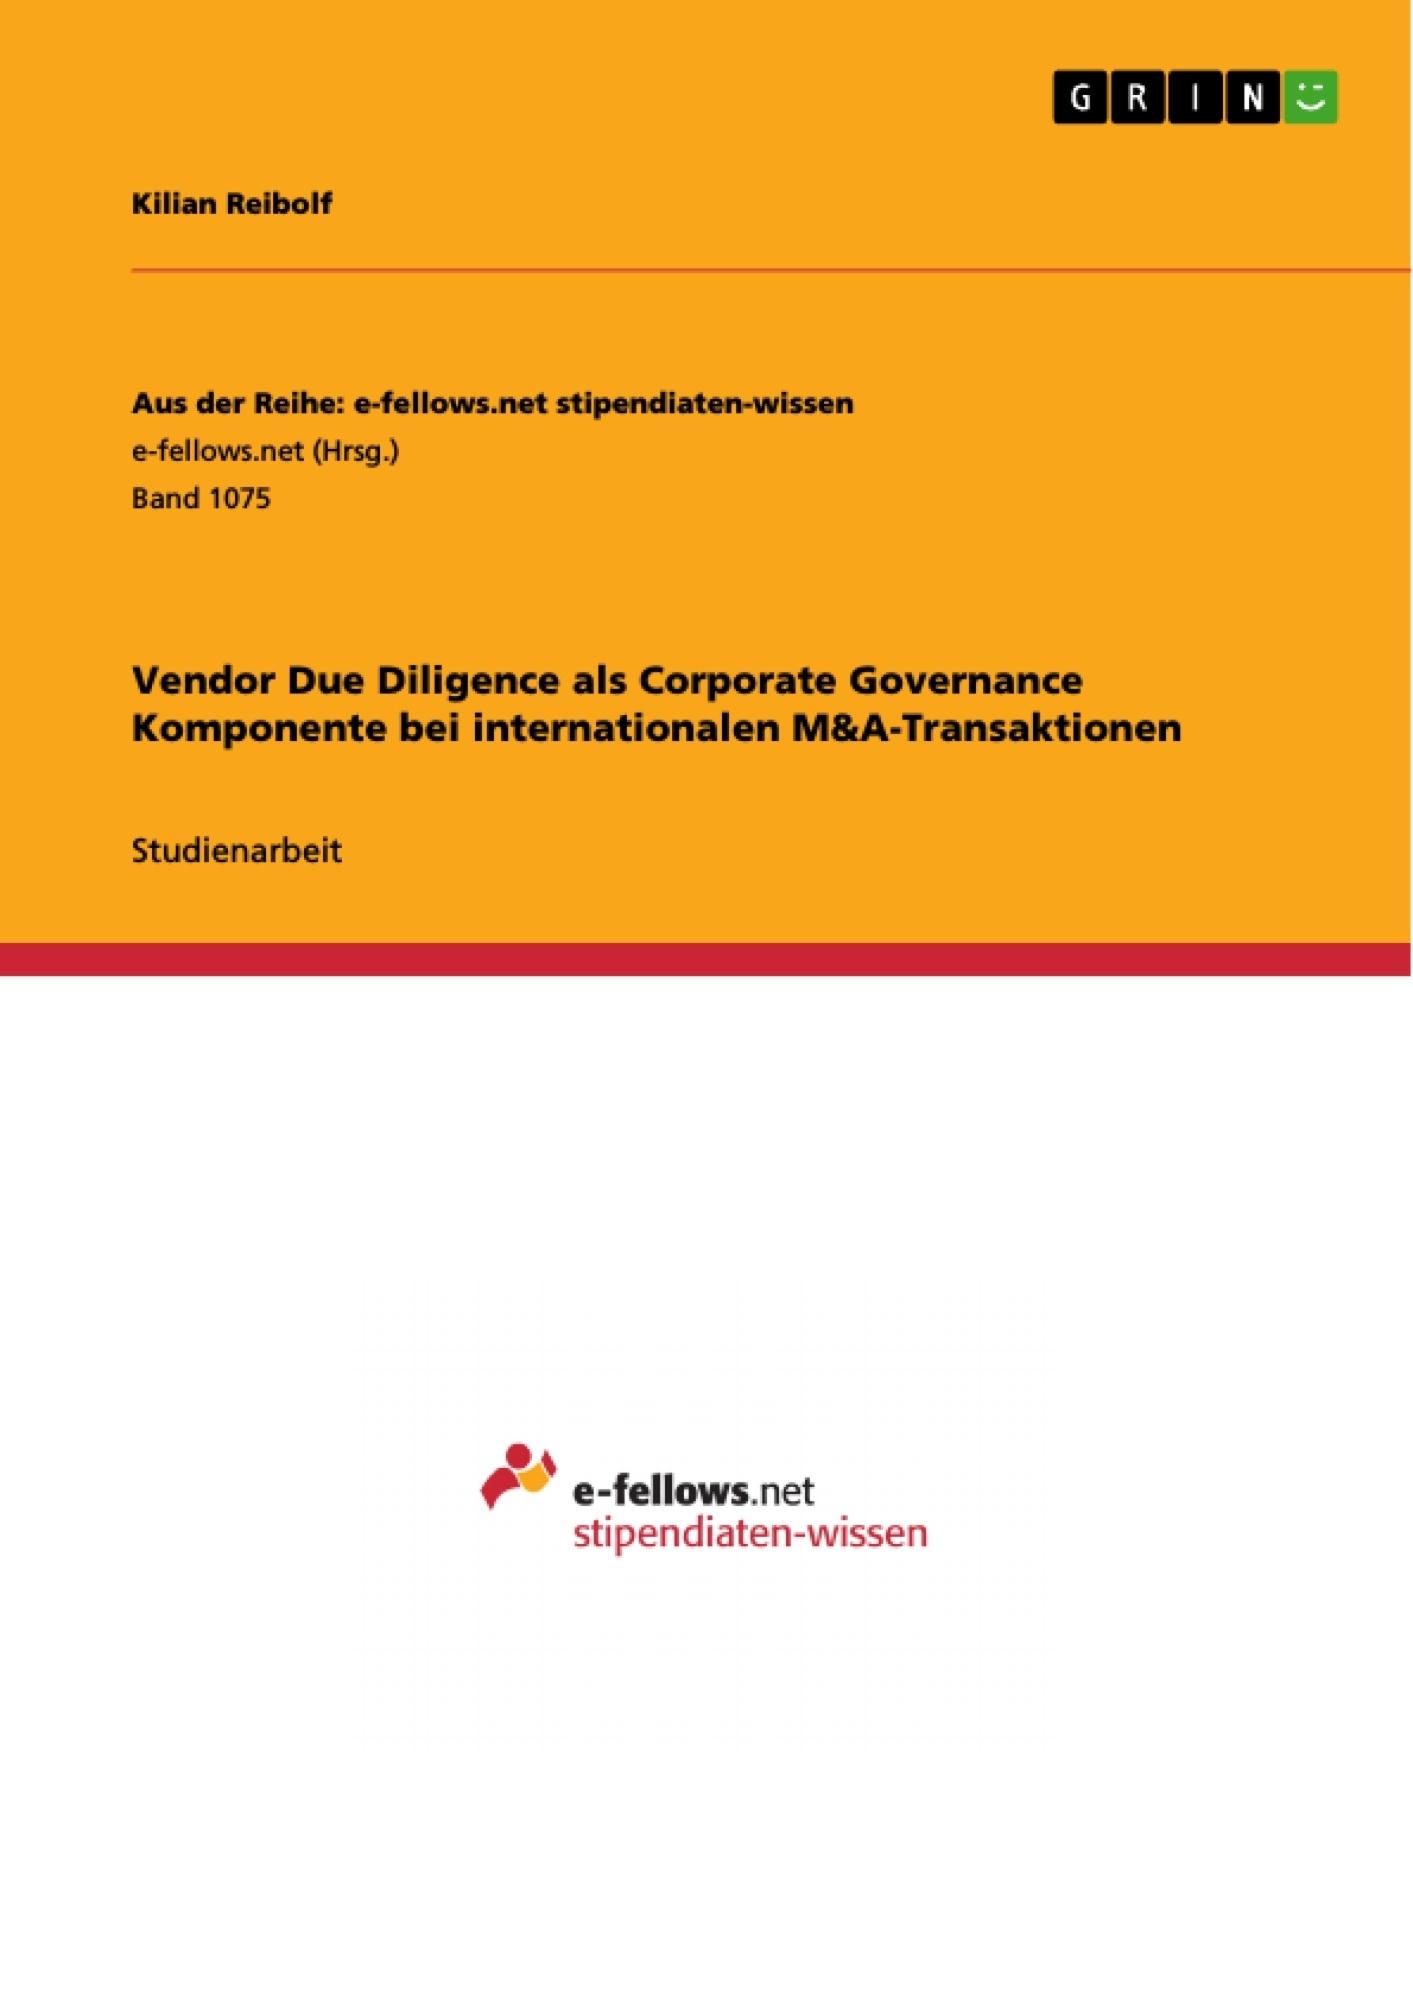 Titel: Vendor Due Diligence als Corporate Governance Komponente bei internationalen M&A-Transaktionen